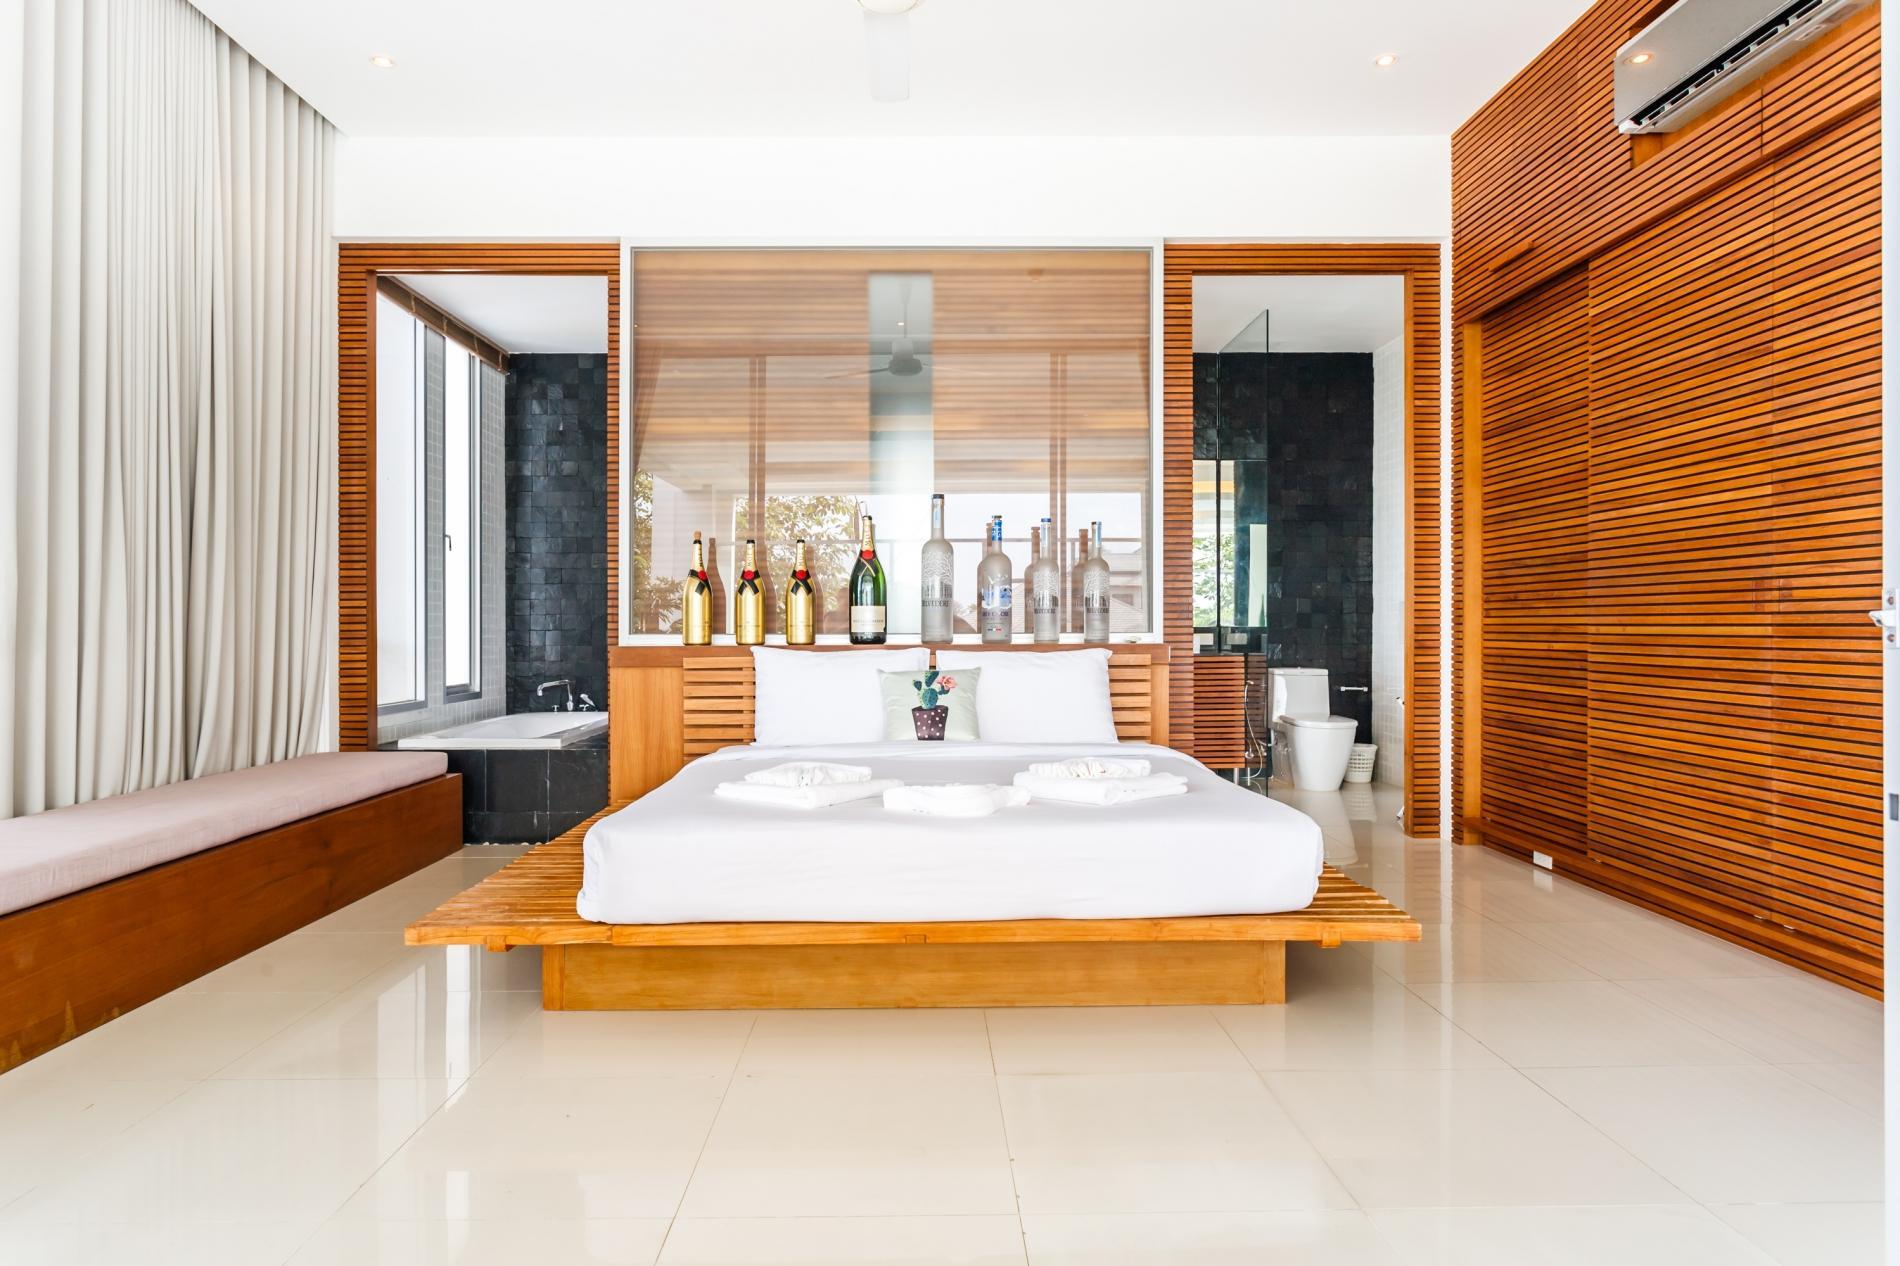 Apartment The Quarter 301 - Luxury Surin 3 bedroom apartment private pool photo 20318464